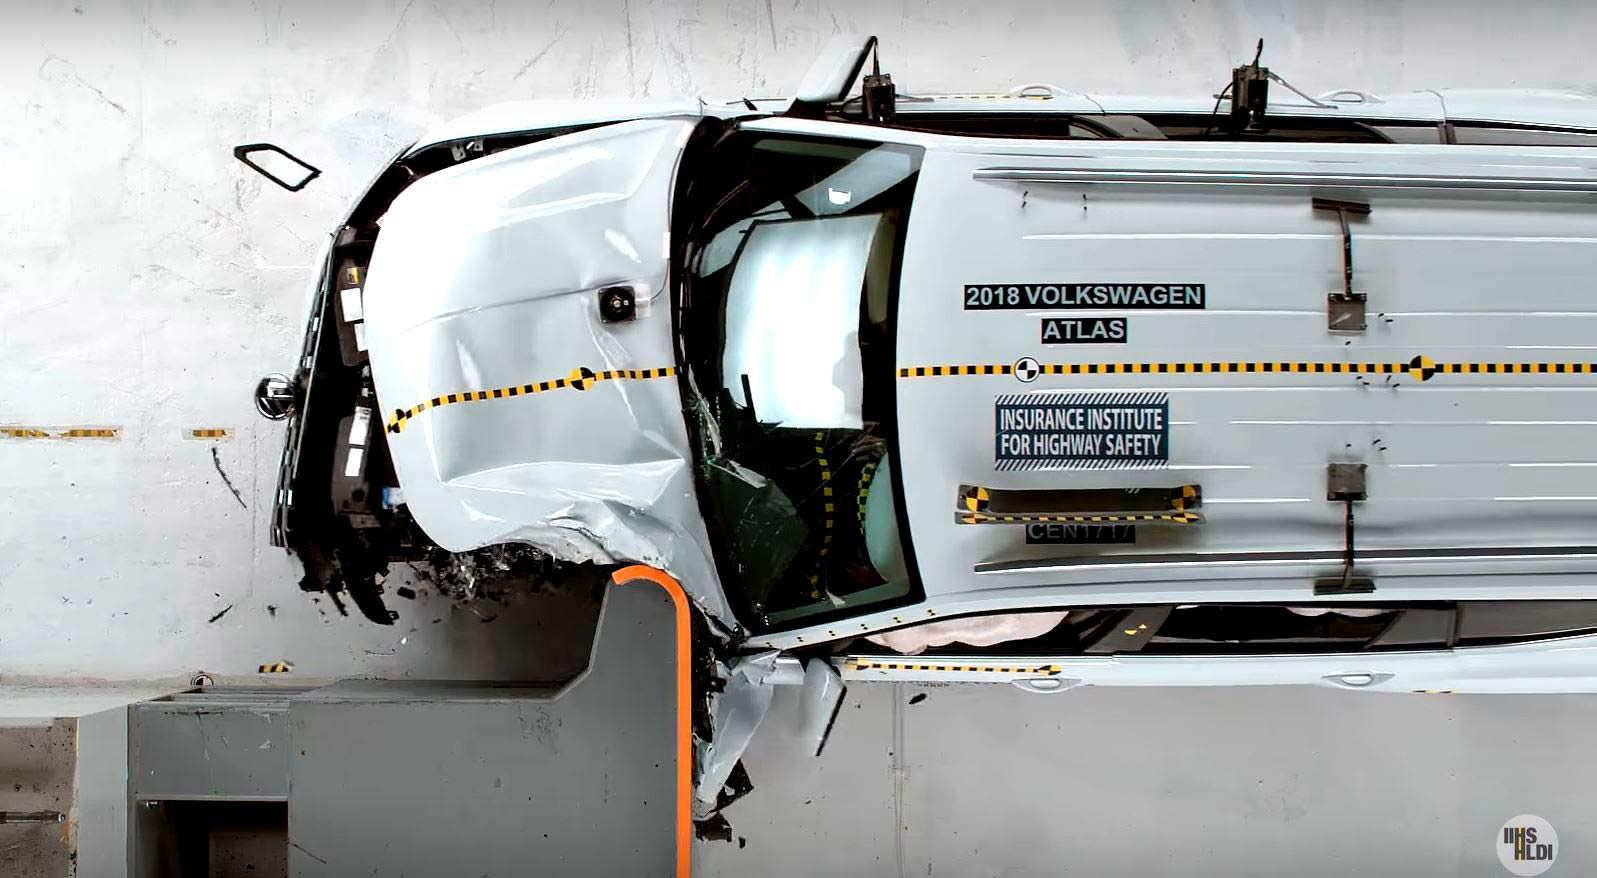 Краш-тест 2018 Volkswagen Atlas от IIHS